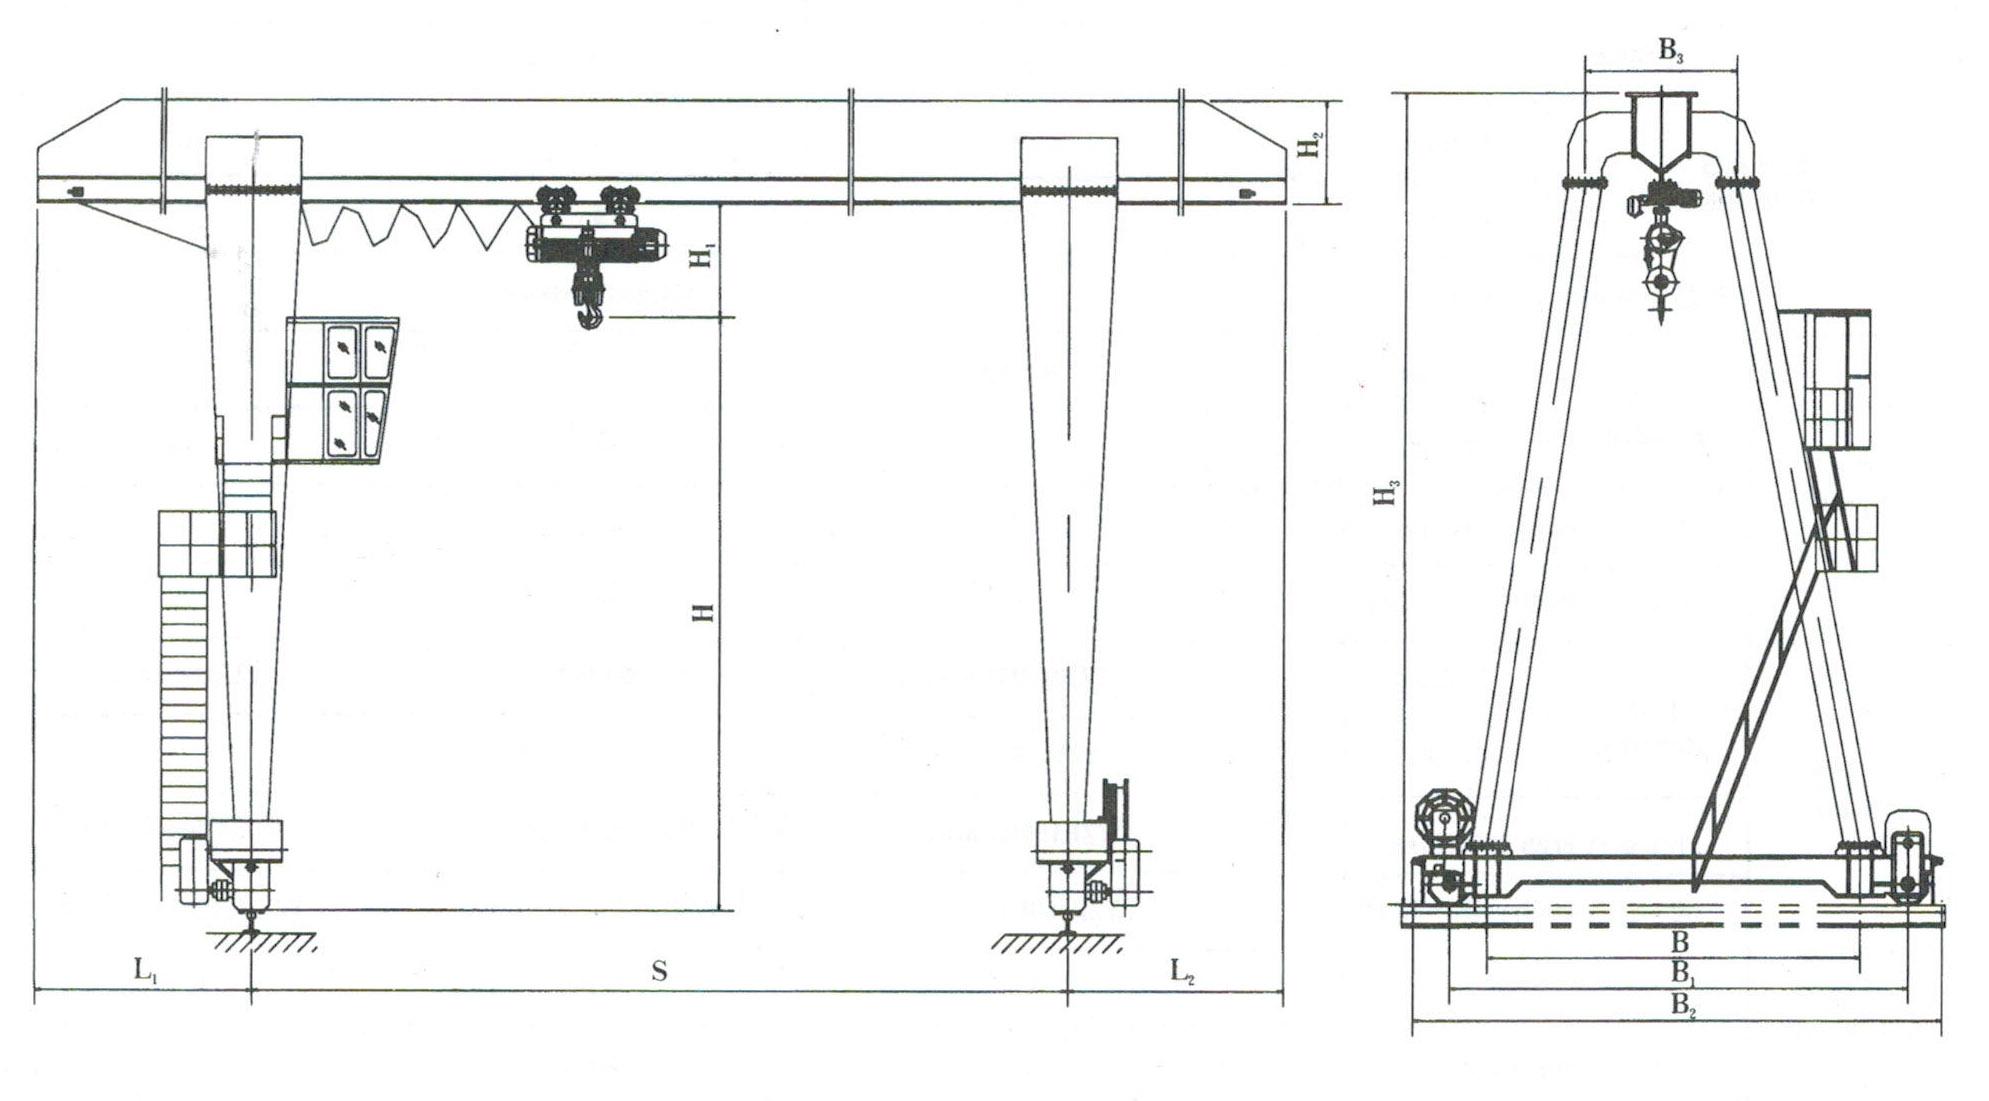 3ton to 32ton truss structure gantry crane with electric hoist 3ton to 32ton truss structure gantry crane with electric hoist pooptronica Images